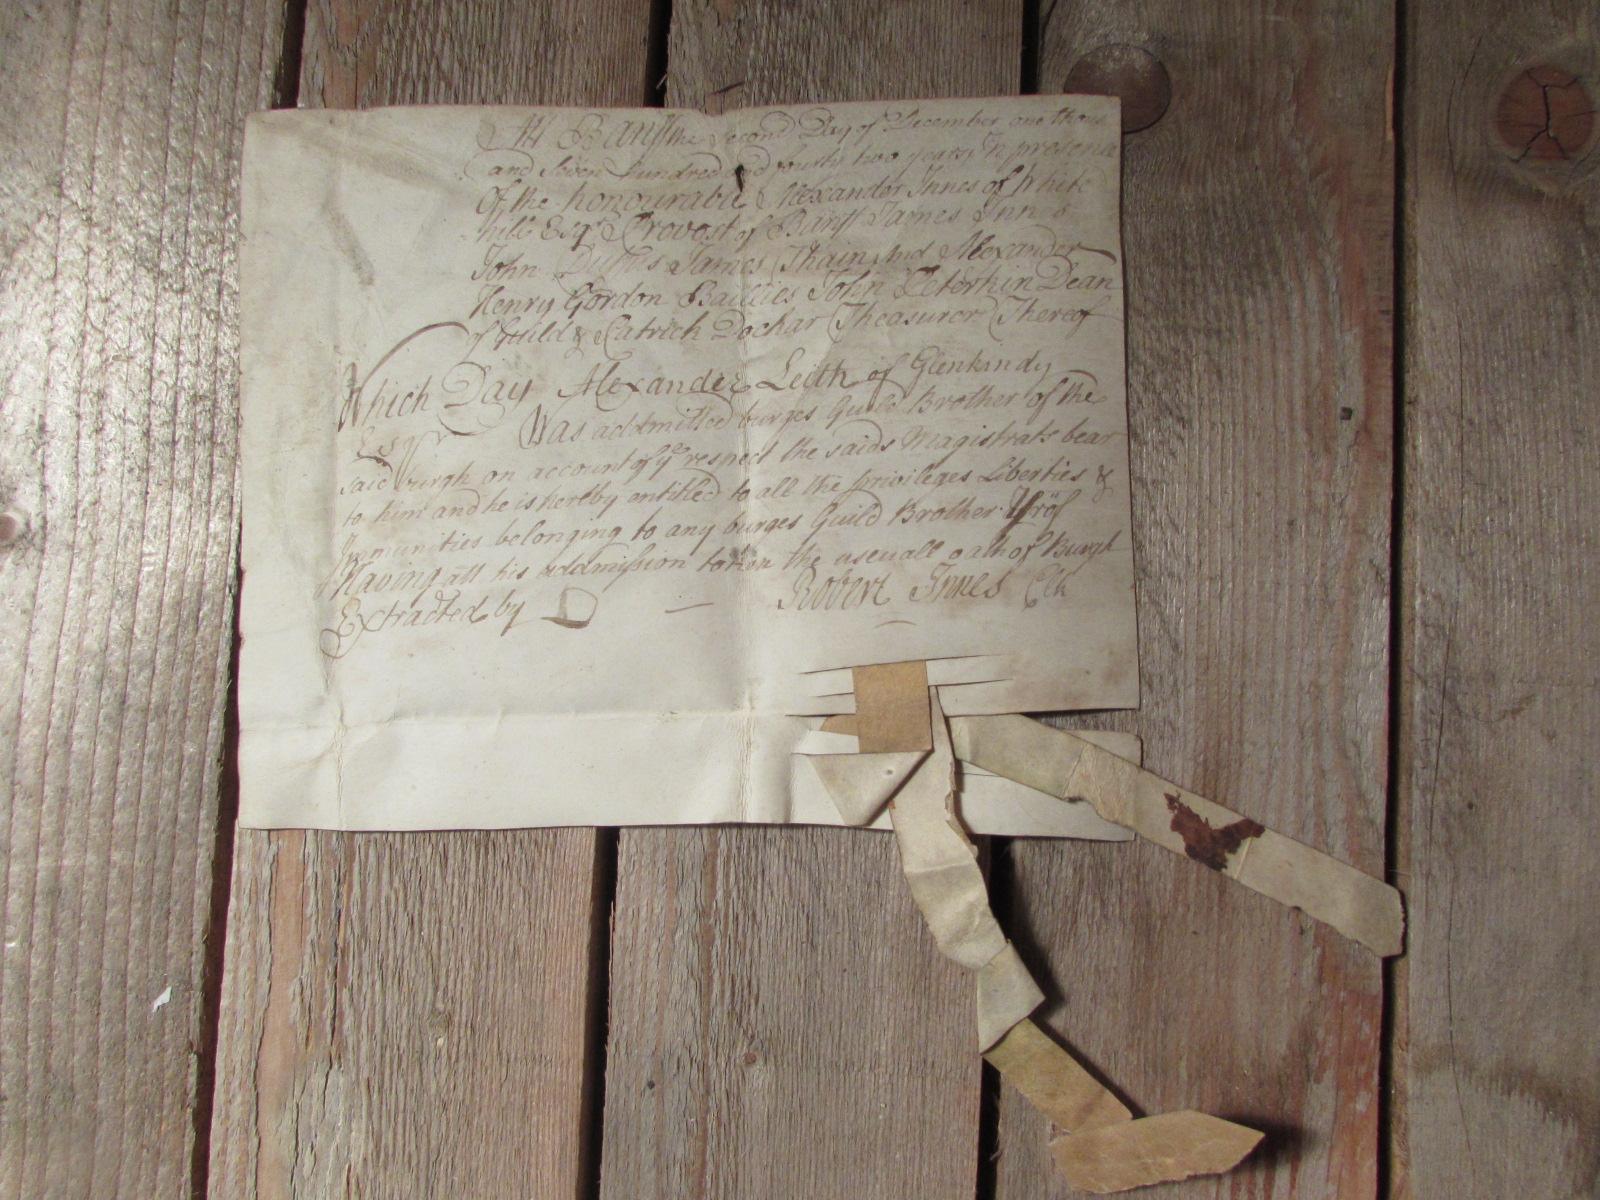 1743 Burges Act (Scottish)